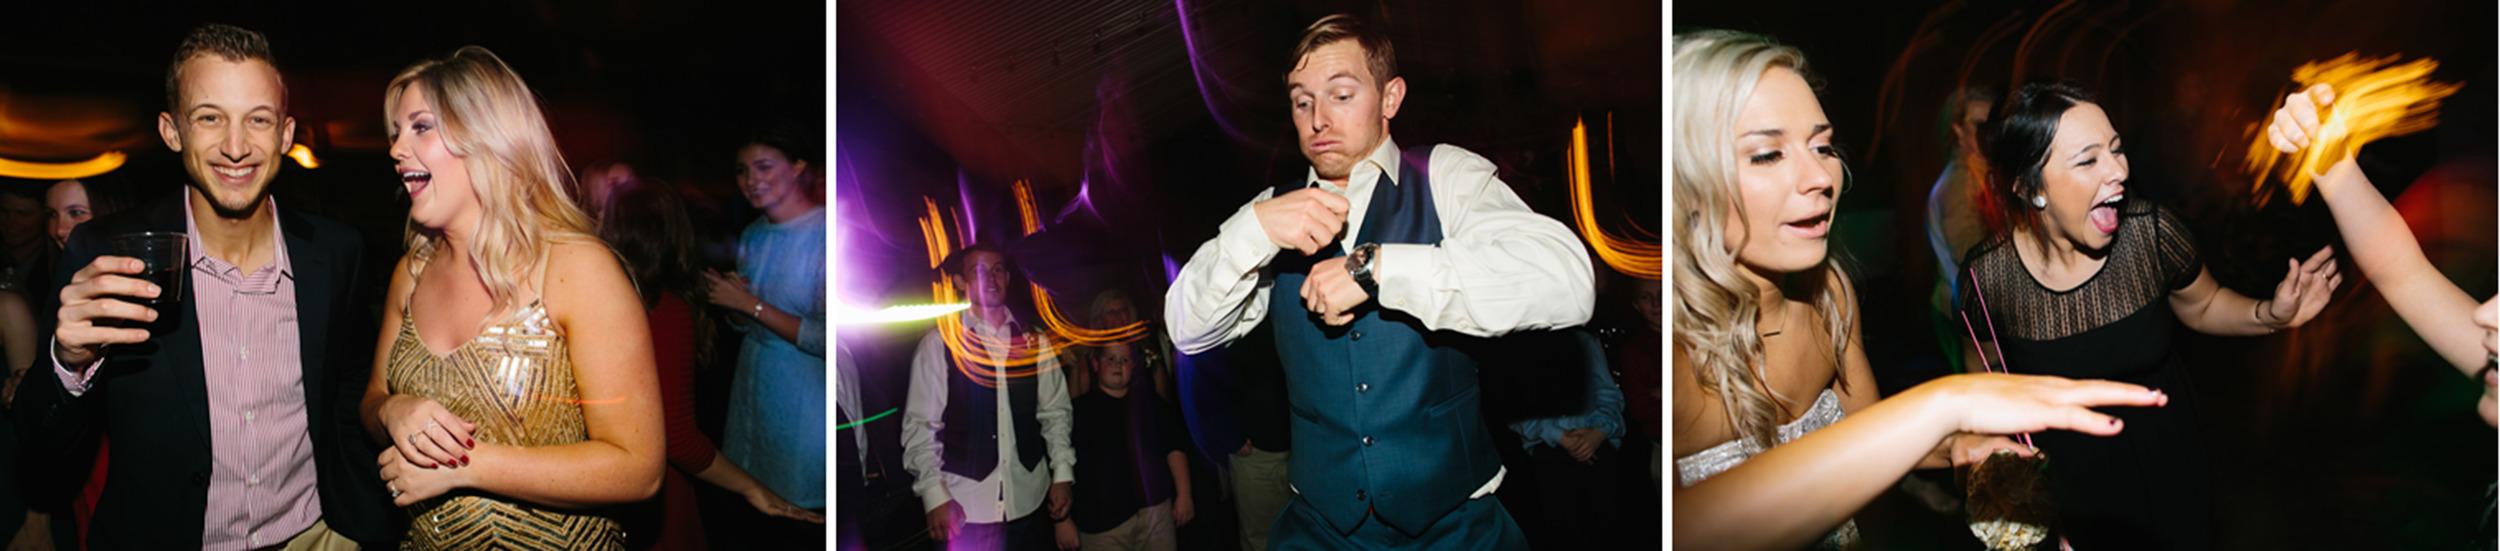 Cotton_Creek_Barn_Winter_Wedding_WeddingPhotographer061.jpg